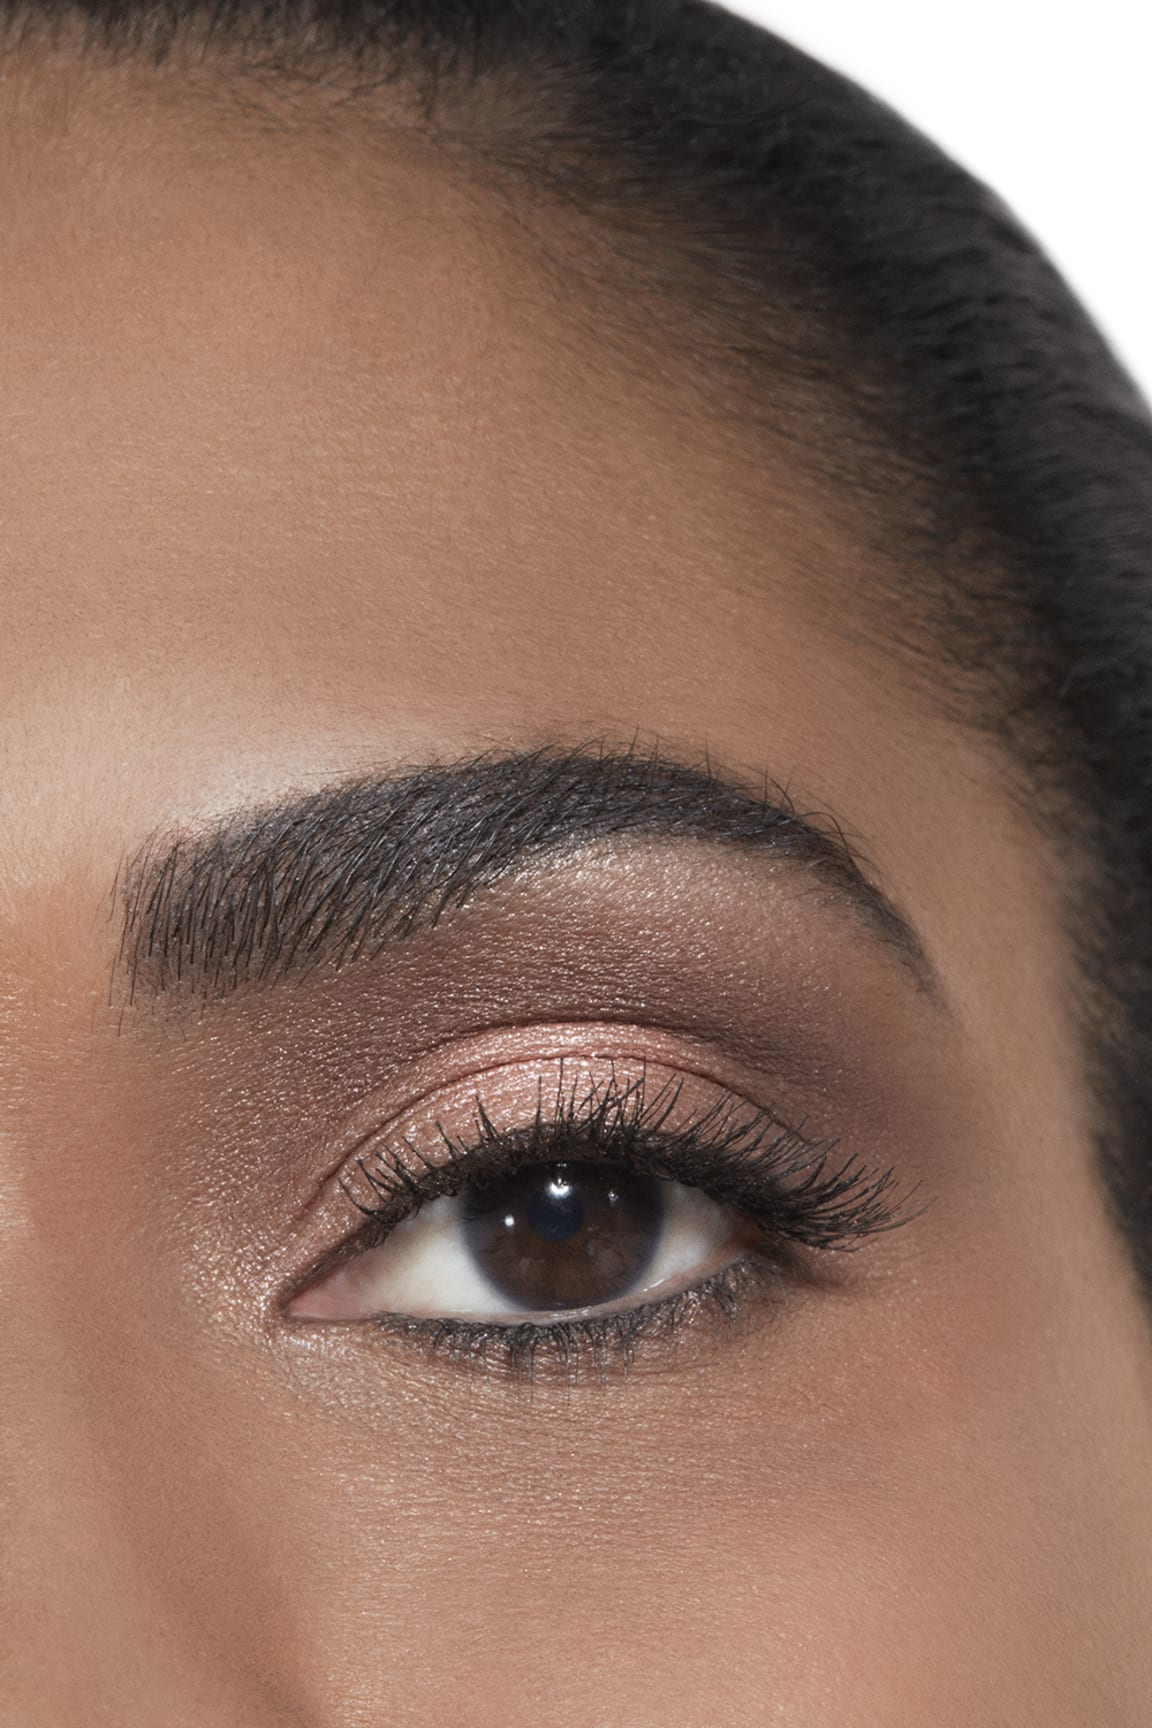 Application makeup visual 2 - LES 4 OMBRES 204 - TISSÉ VENDÔME